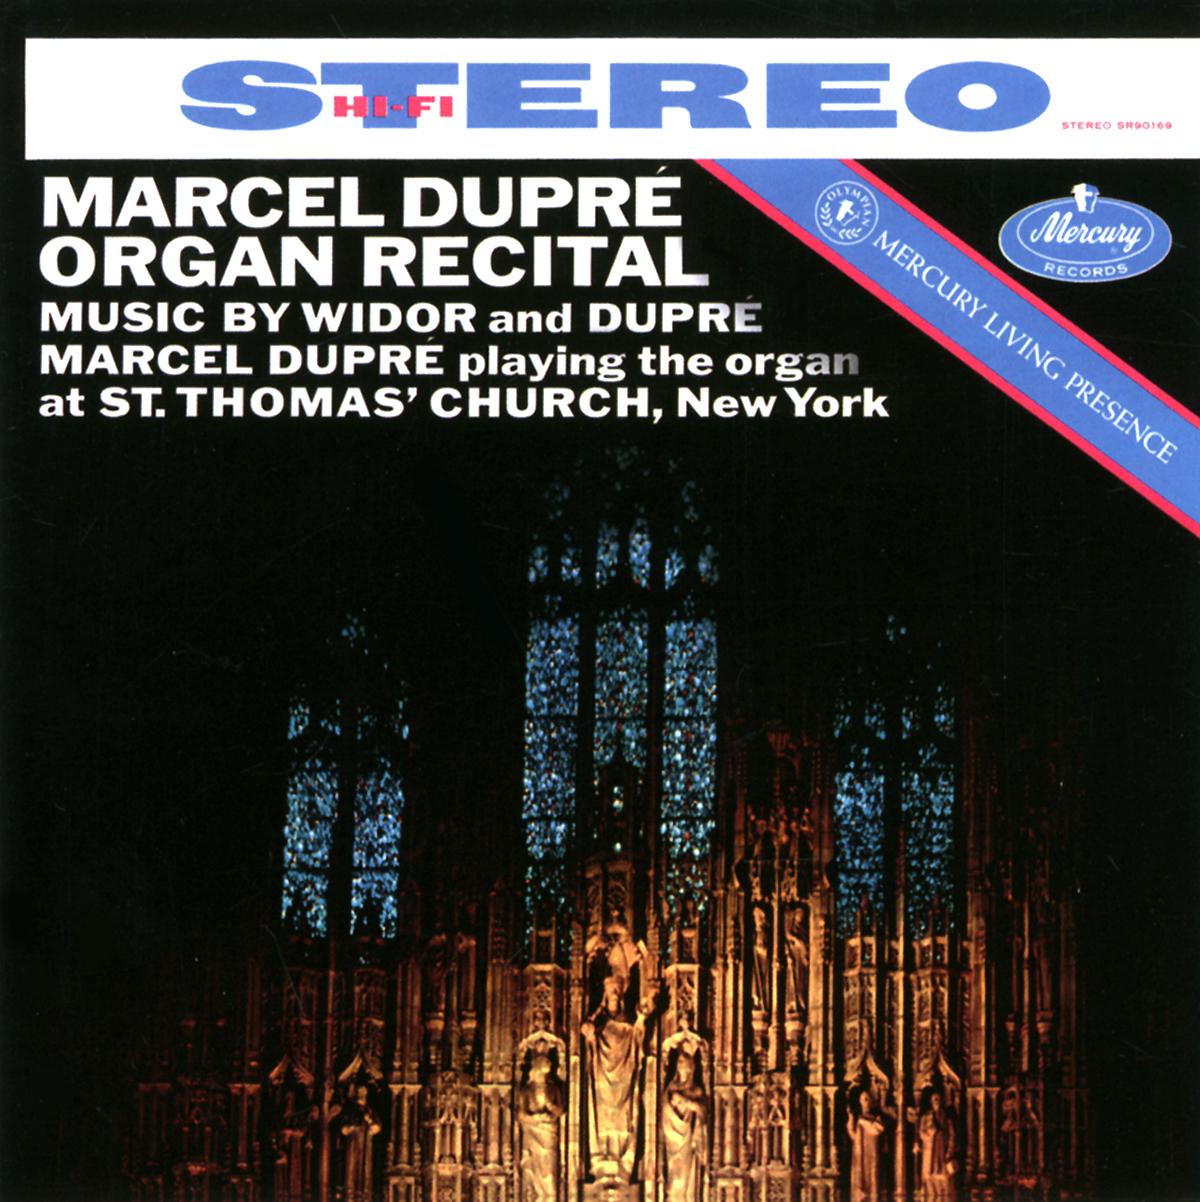 Marcel Dupre. Widor And Dupre. Organ Recital